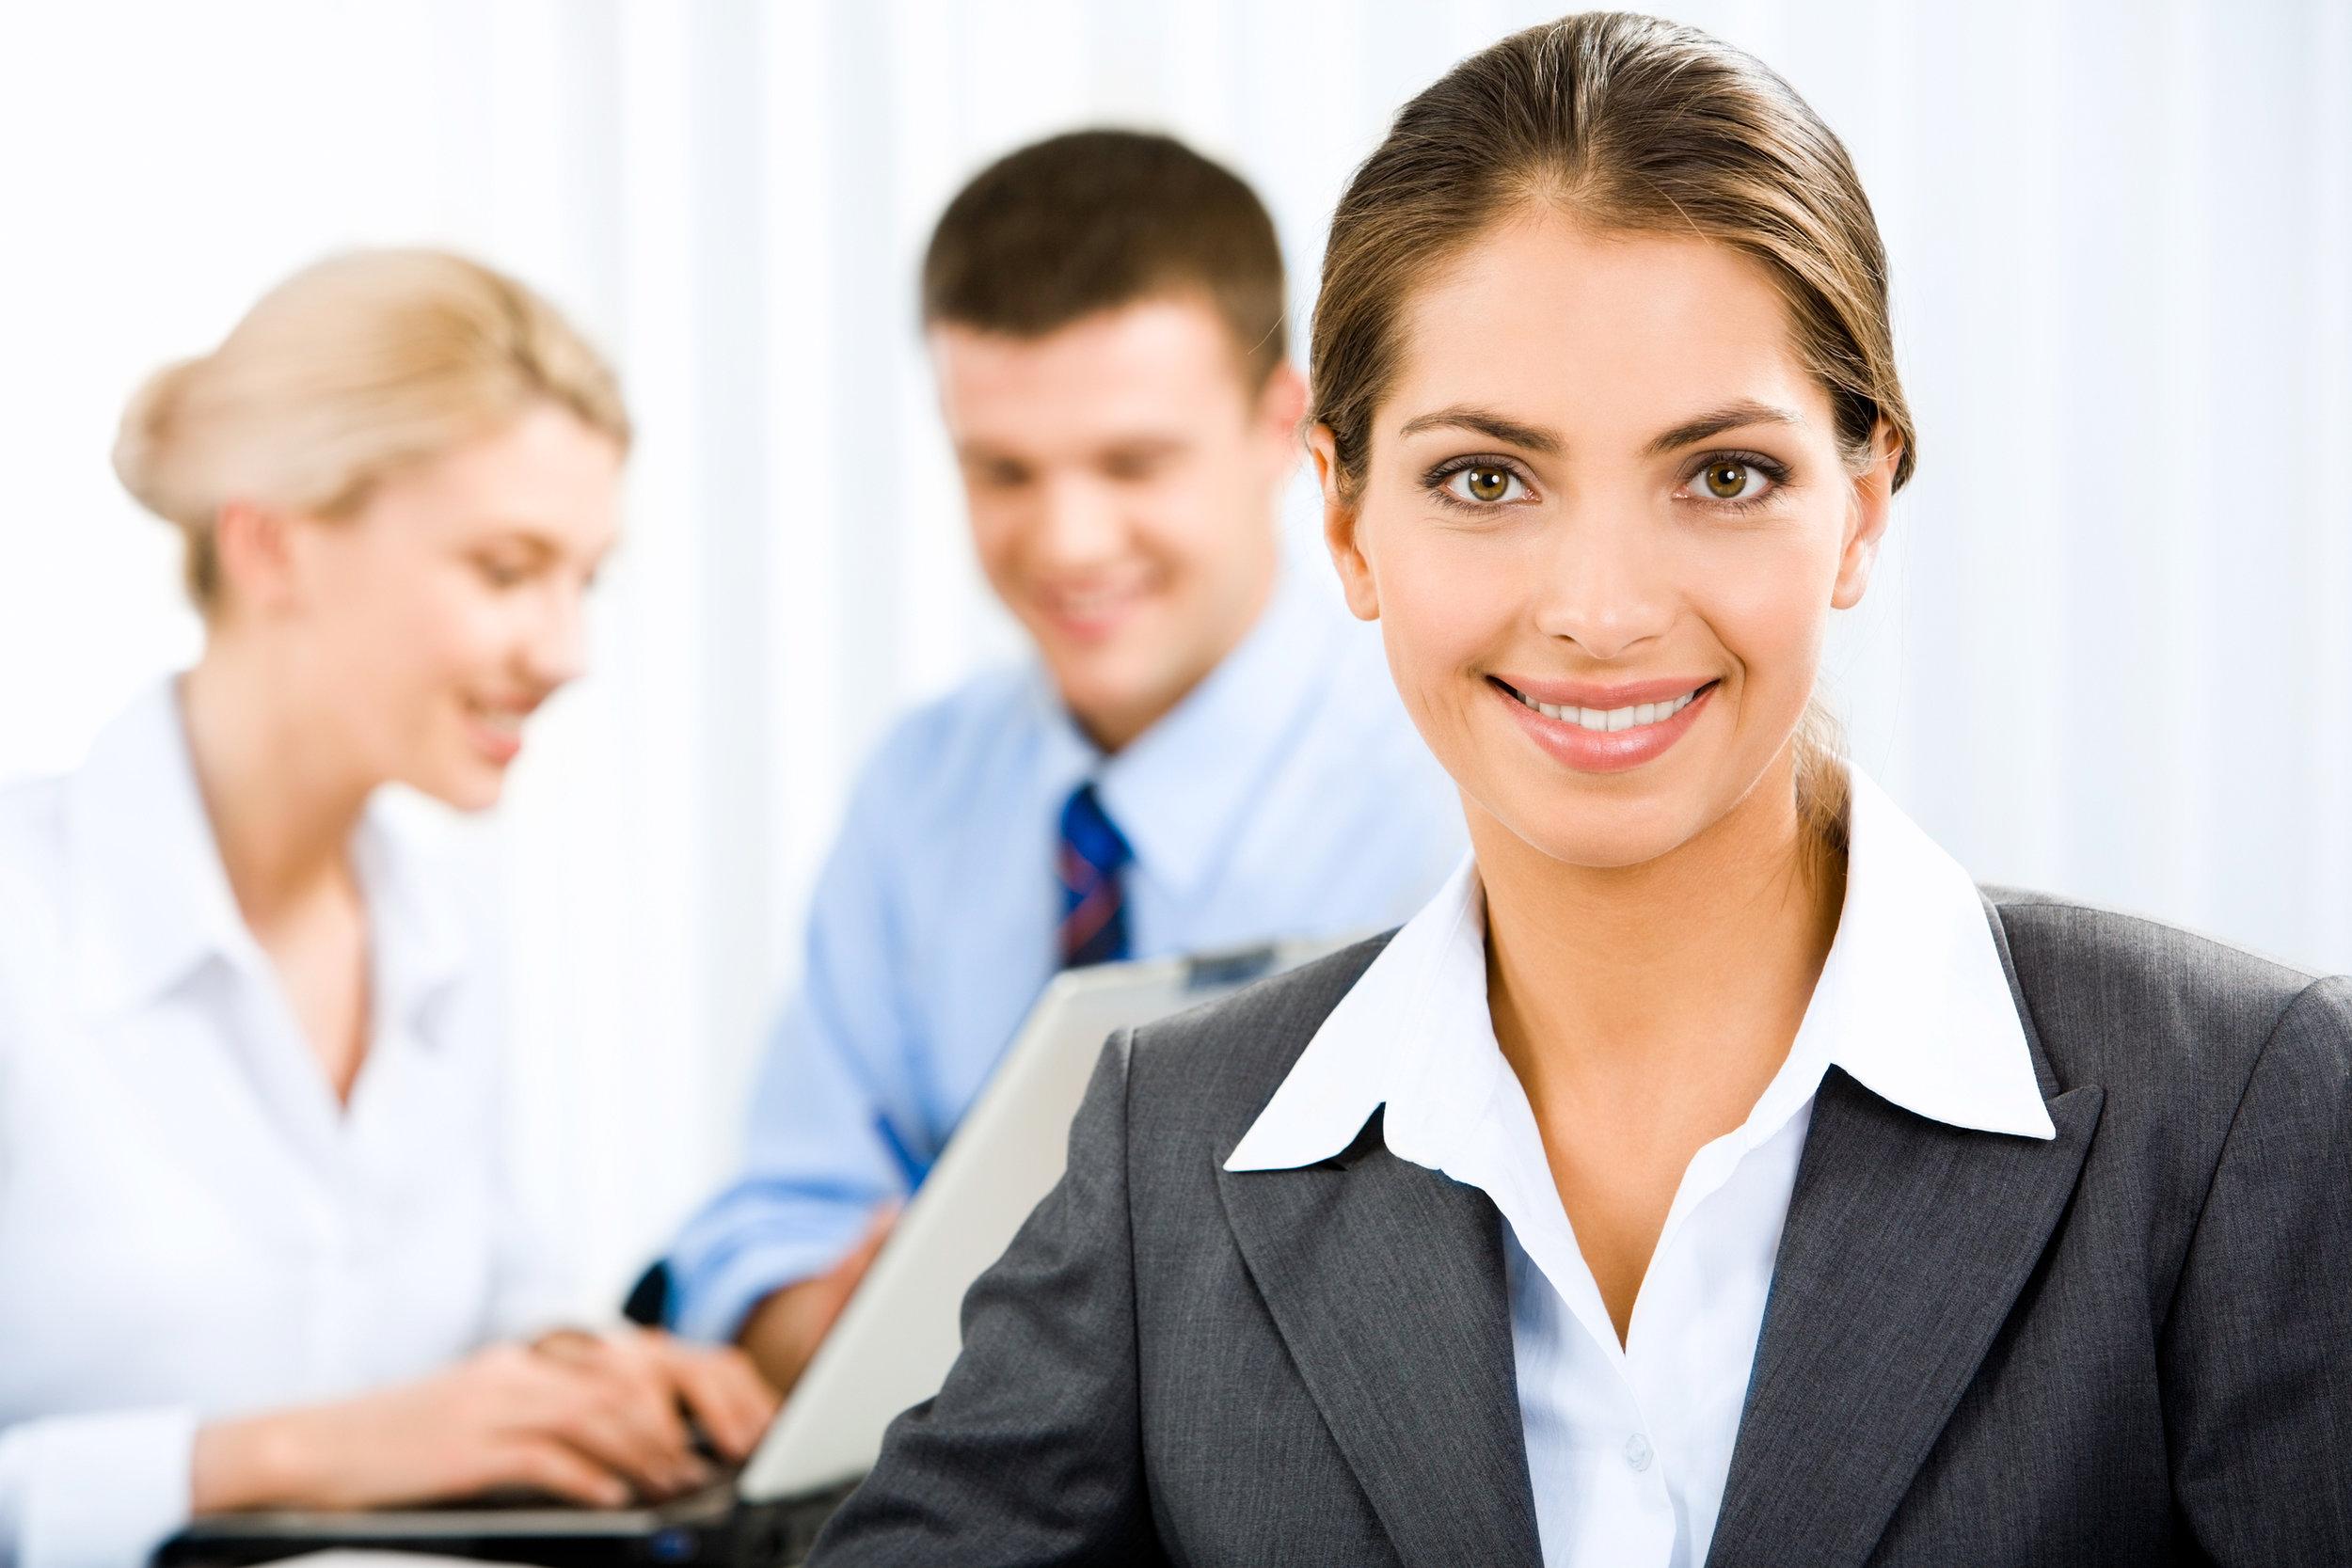 Bigstock- 103252546 - Business Woman.jpg